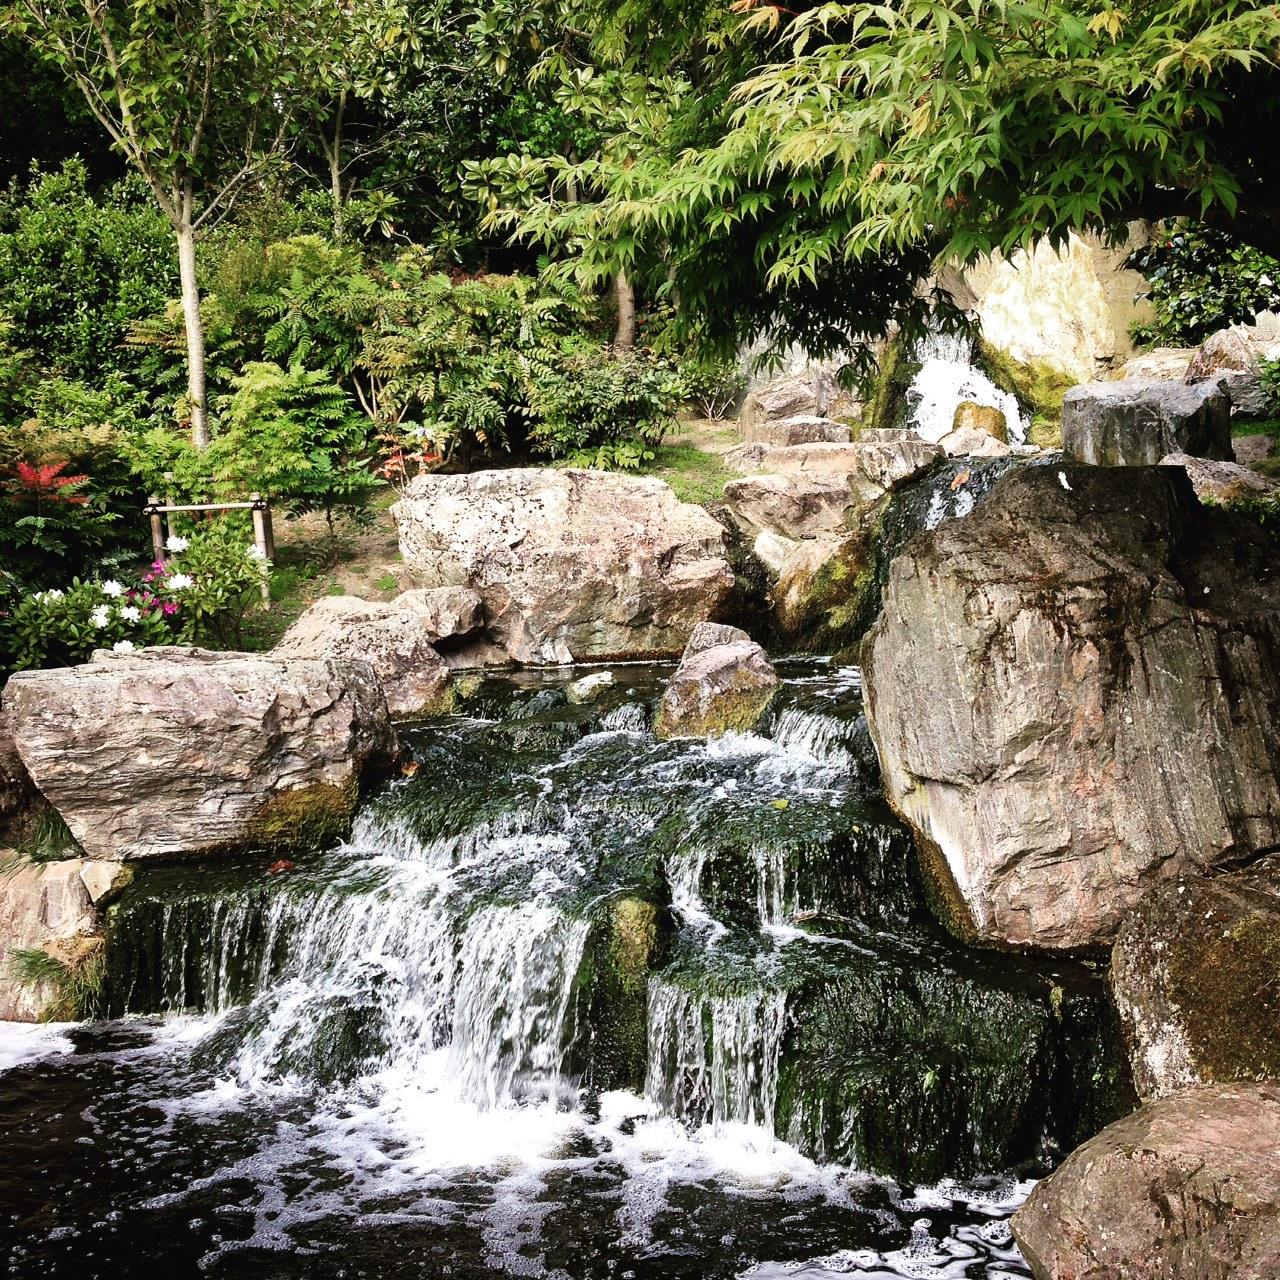 Kyoto gardens - Holland gardens London